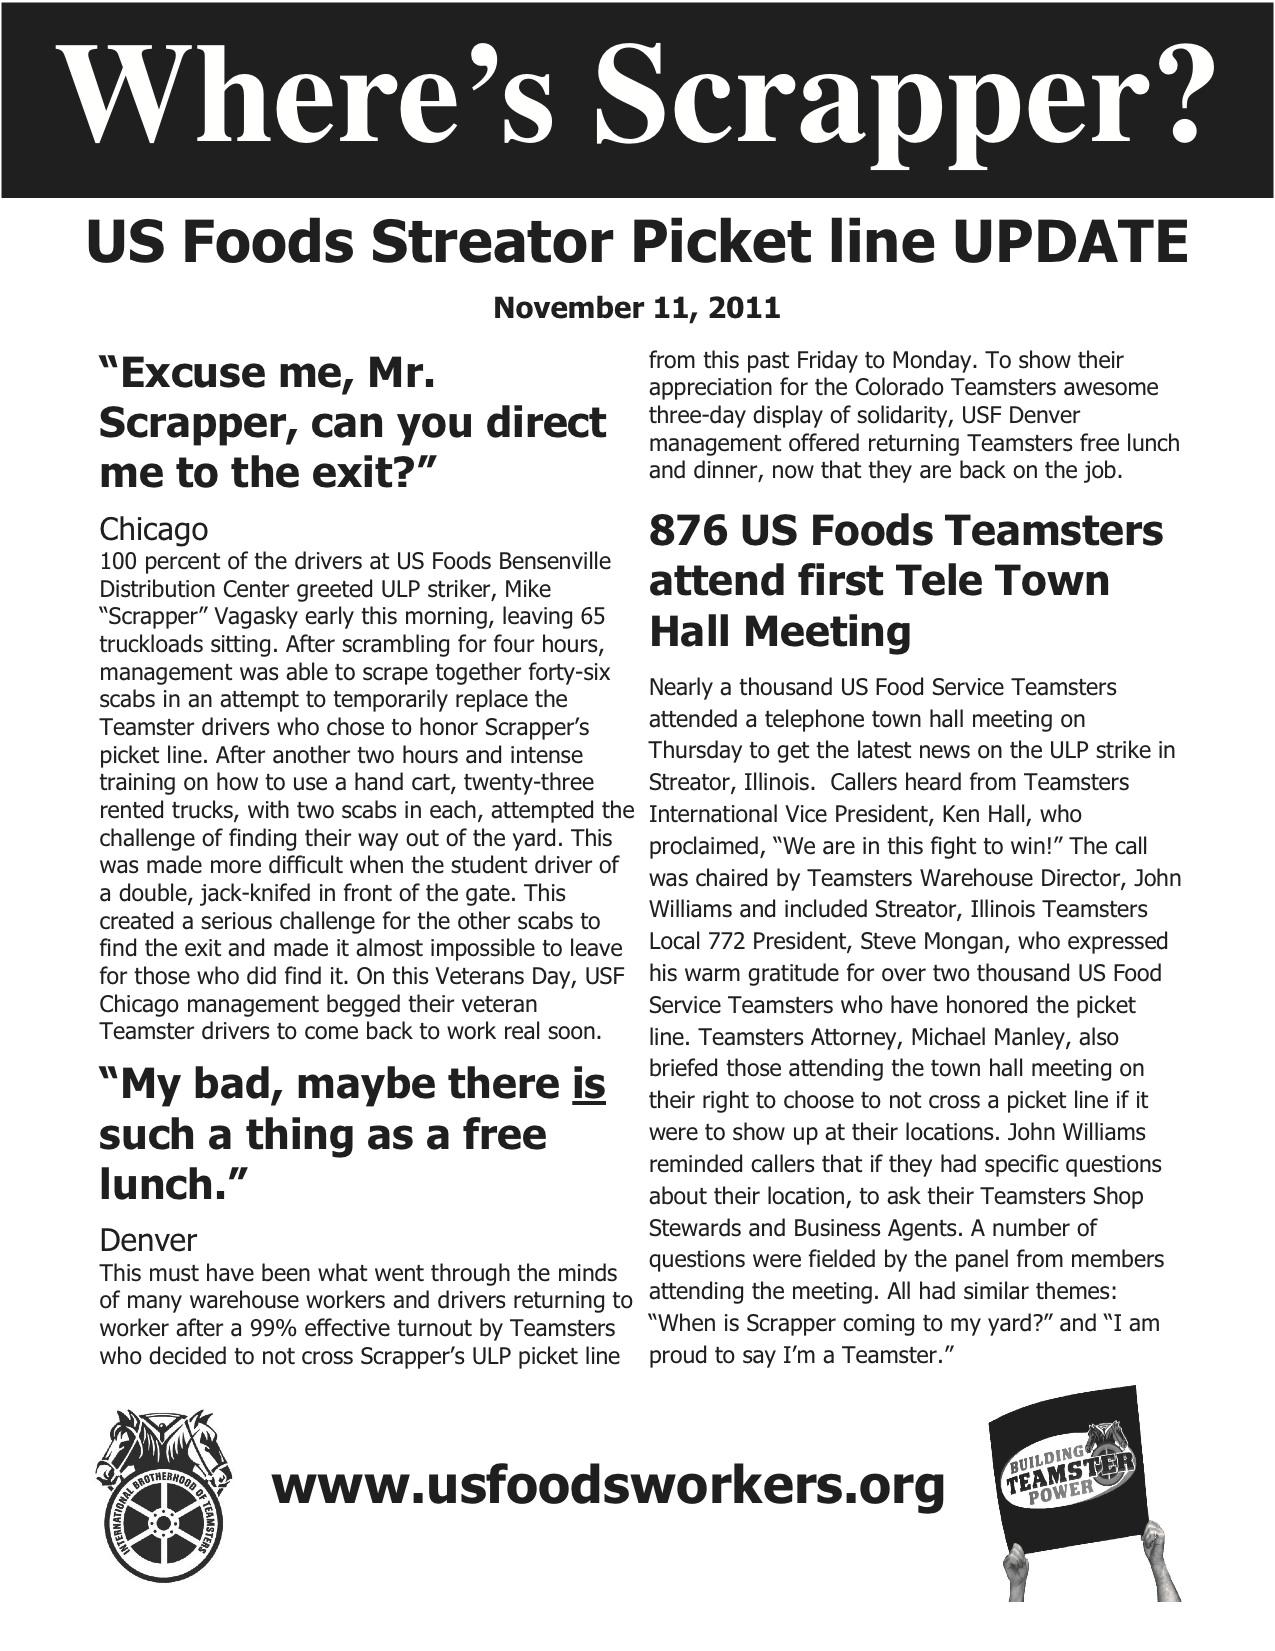 Update on US Foods Streator (IL) Picket Line